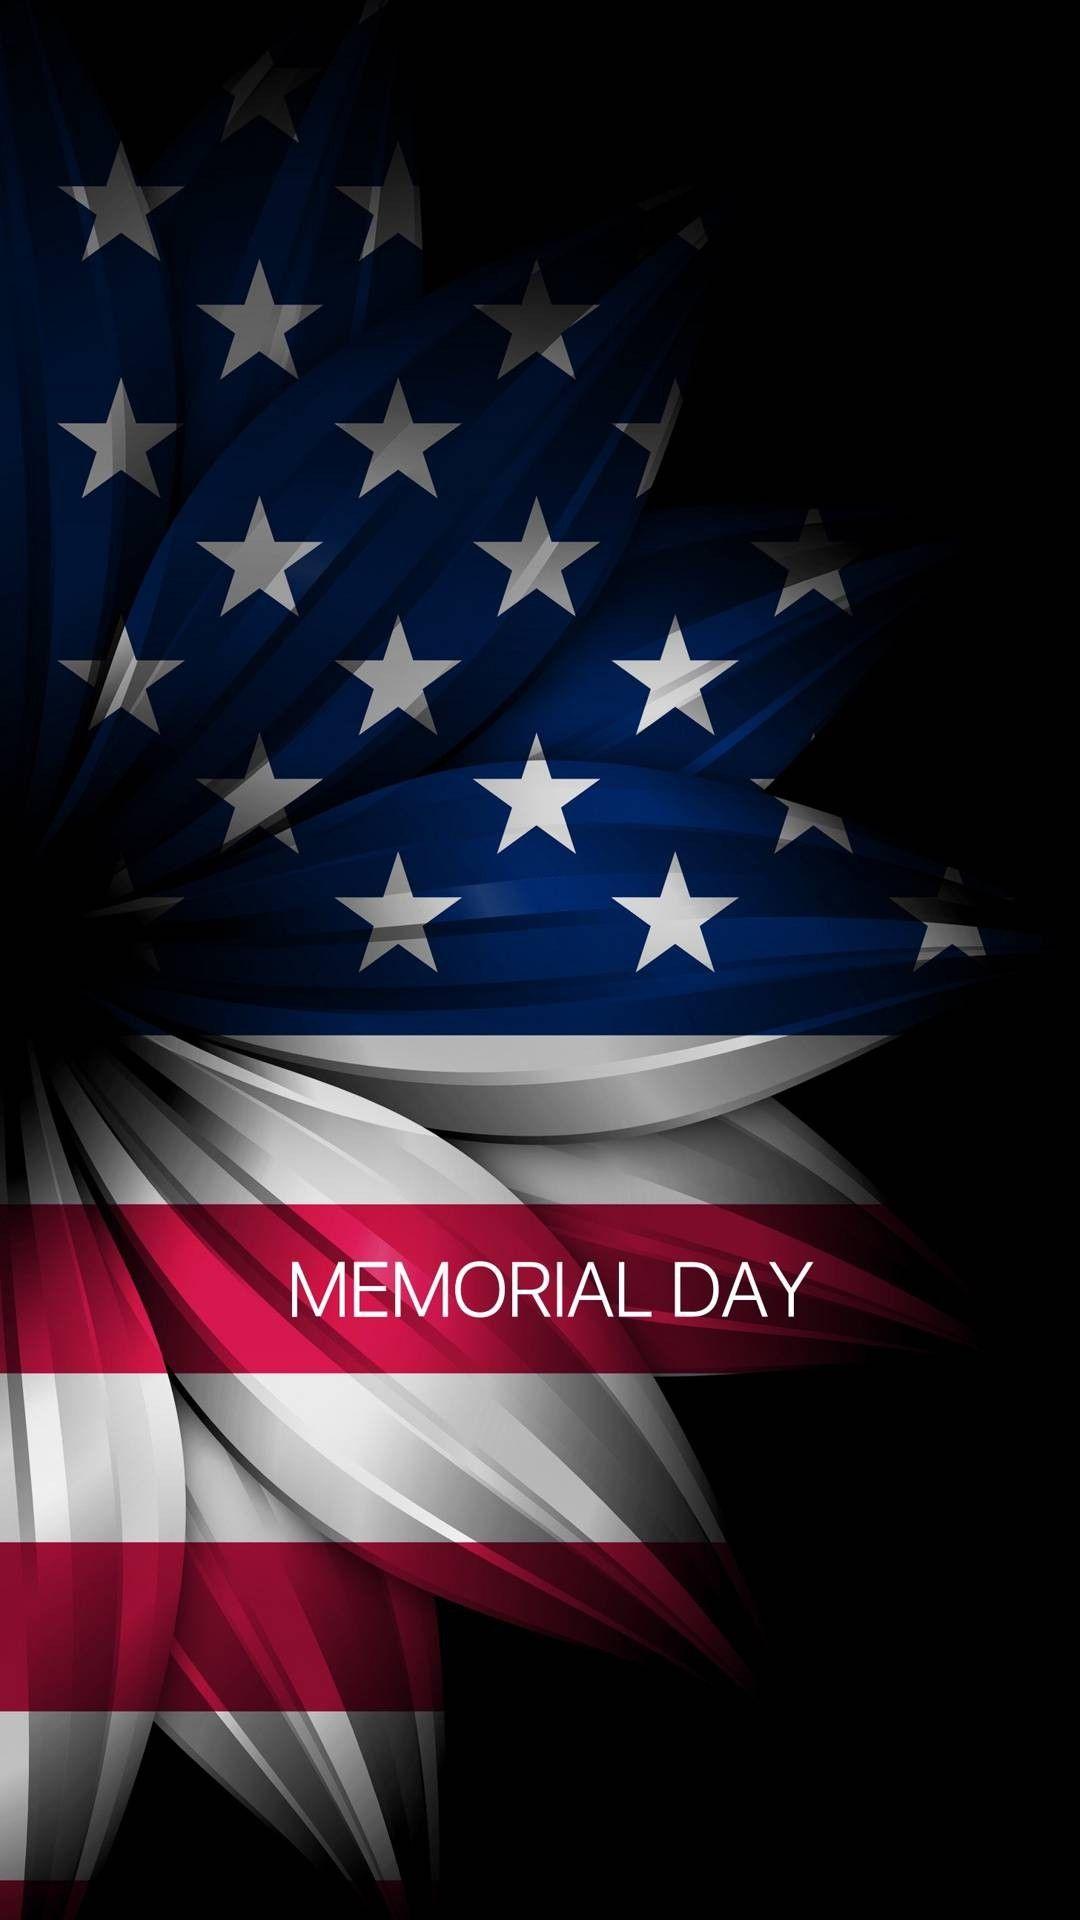 Memorial Day Patriotic Wallpaper American Flag Wallpaper Cute Computer Backgrounds